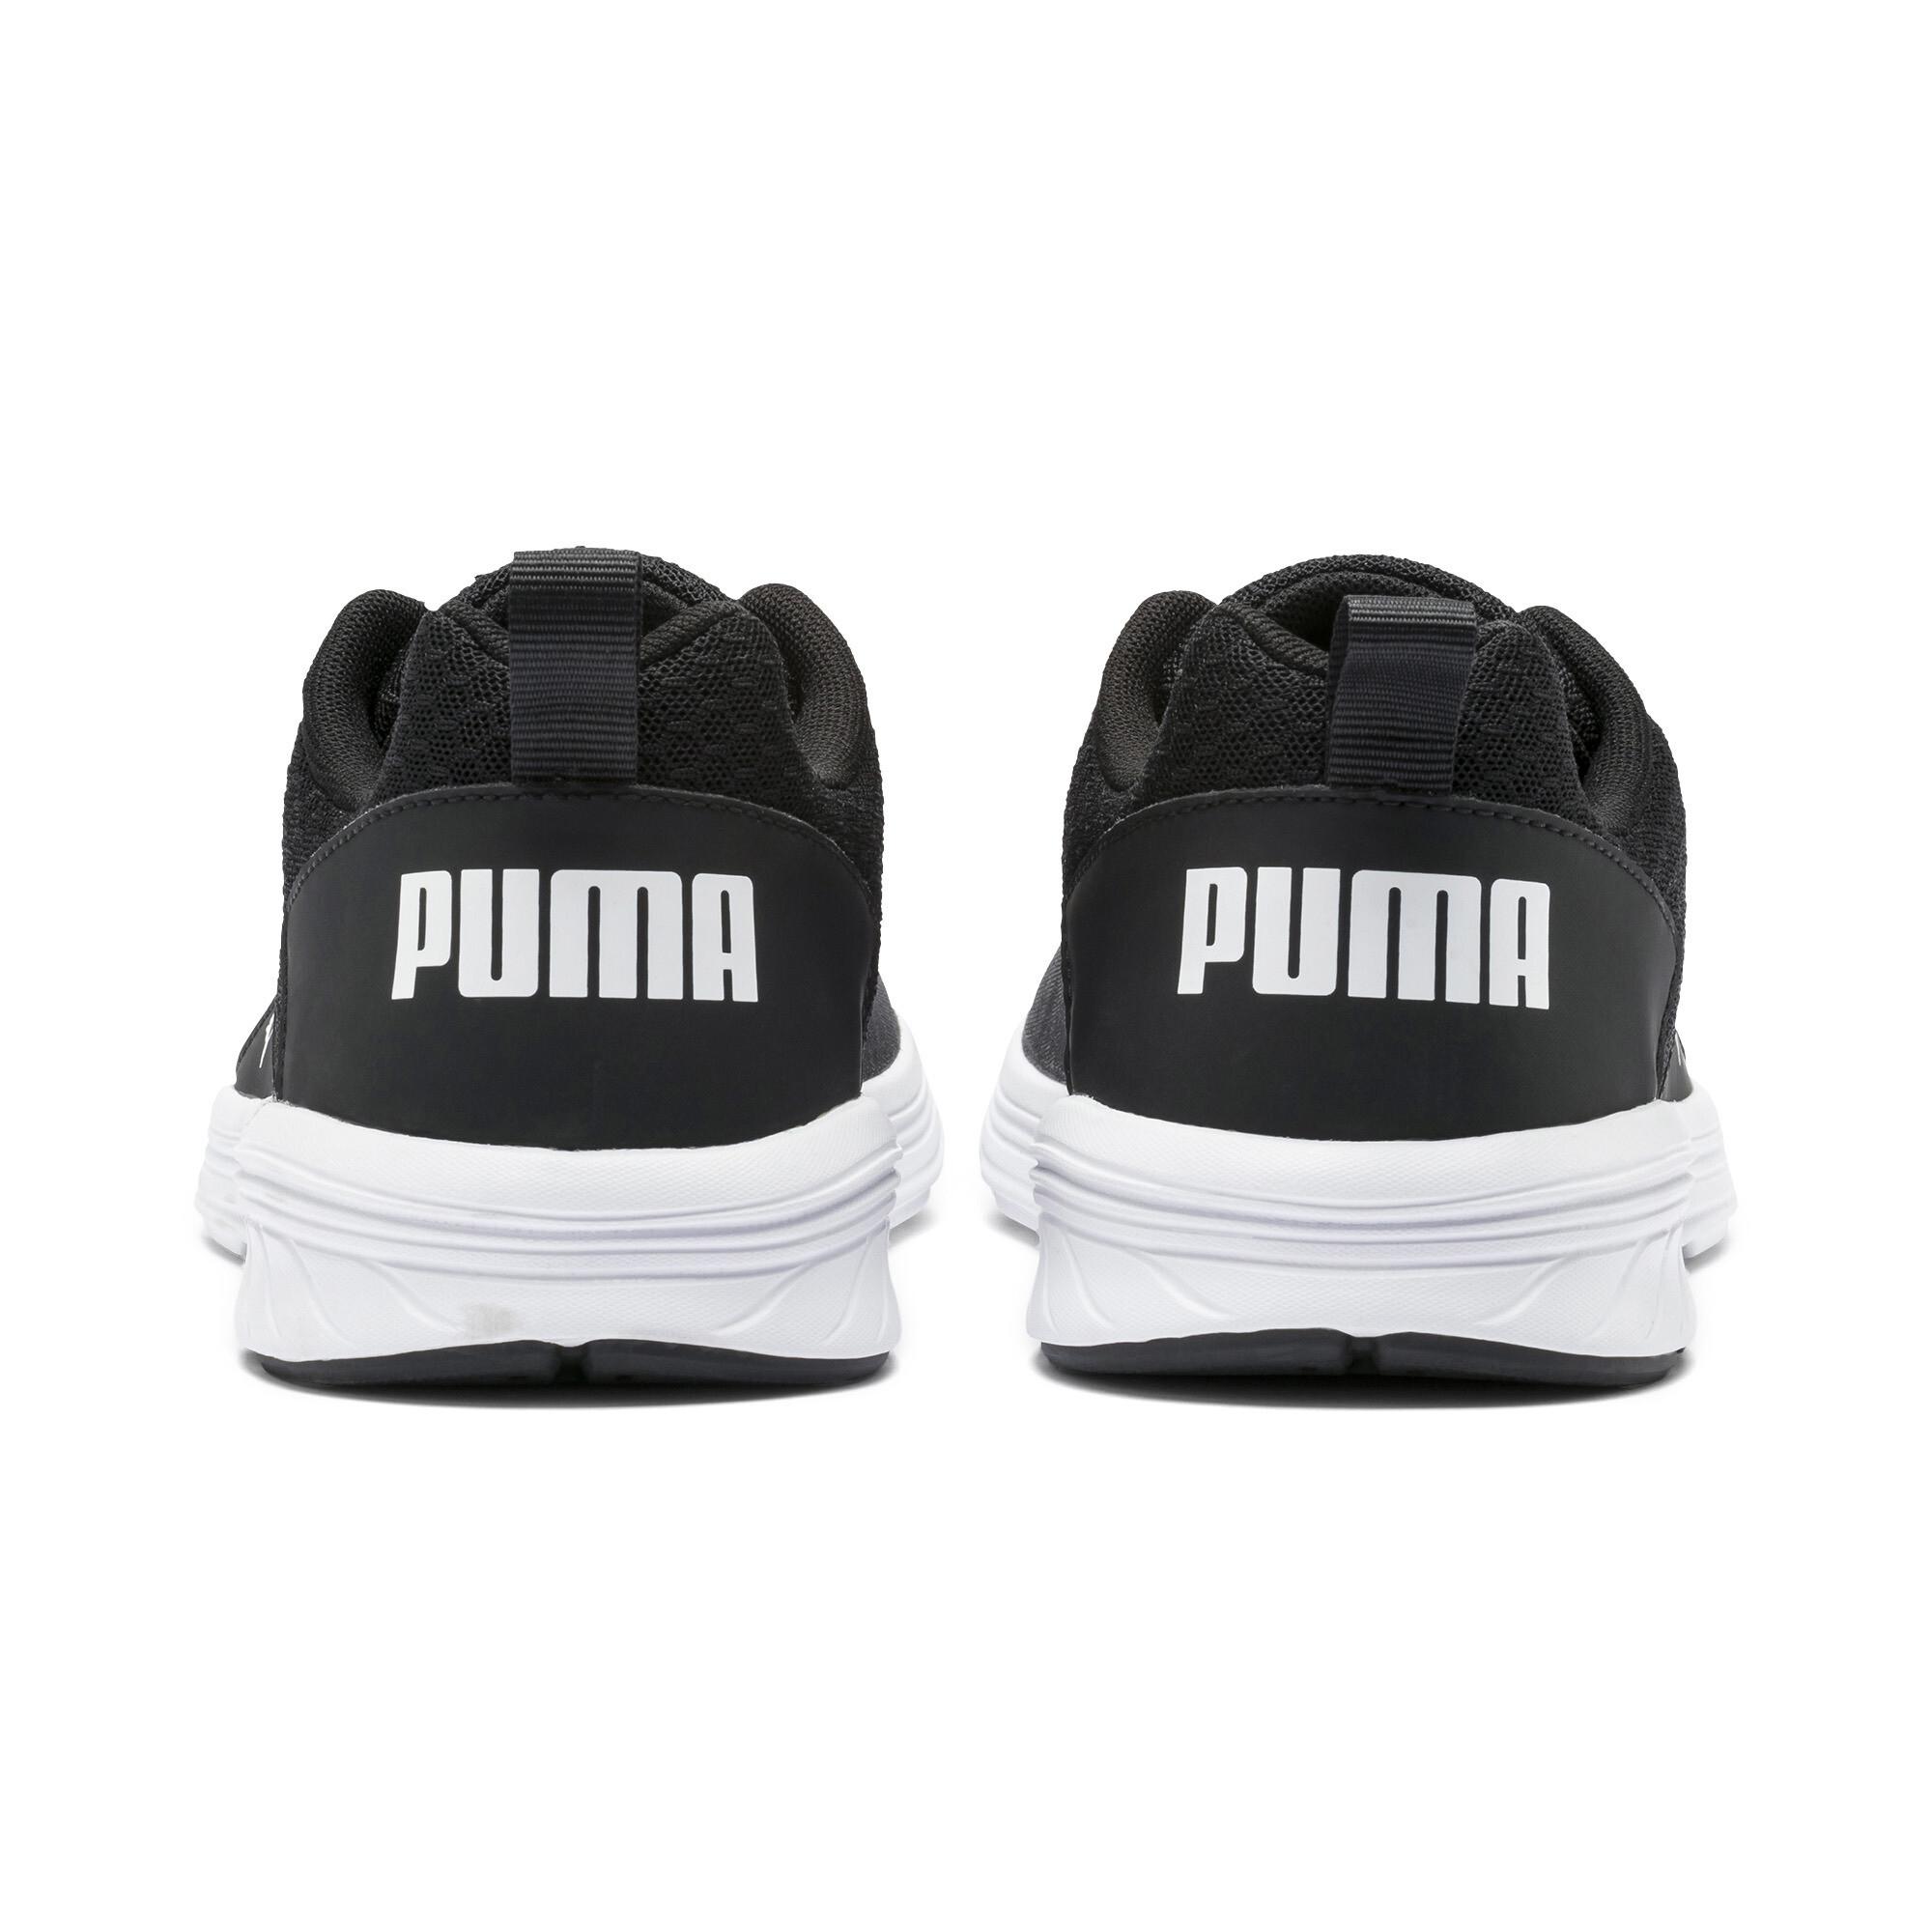 PUMA-NRGY-Comet-Men-039-s-Running-Shoes-Men-Shoe-Running thumbnail 8